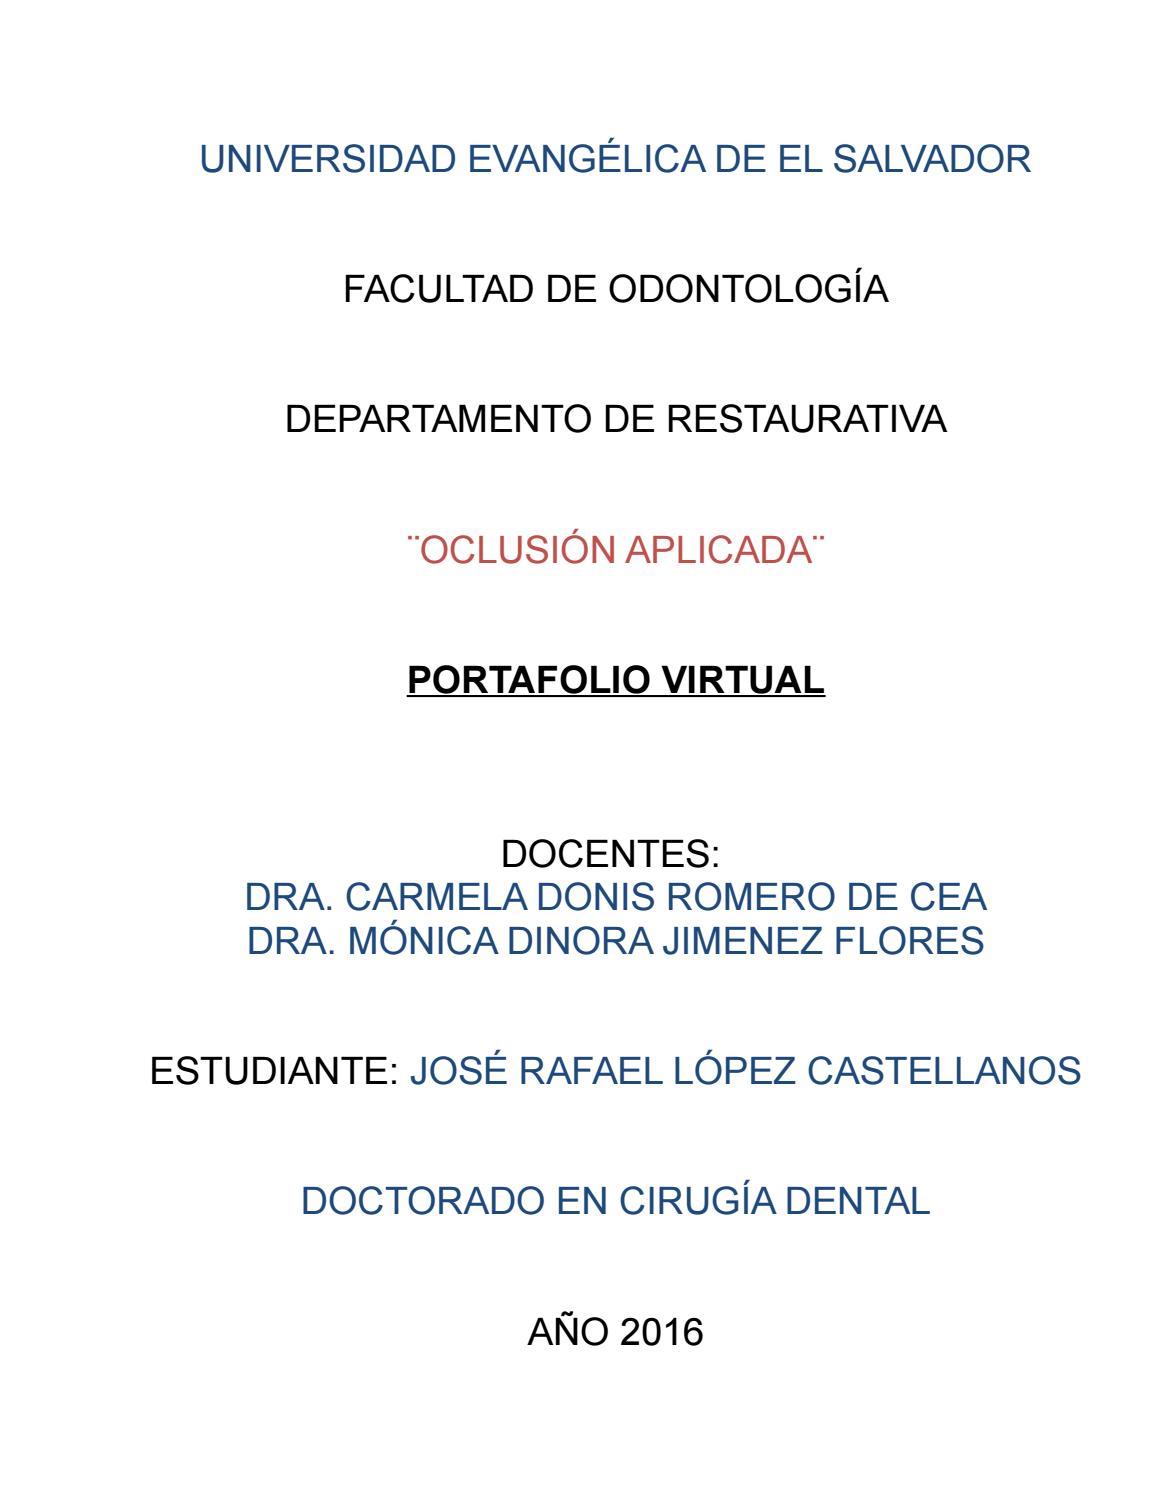 Portafolio virtual oclusión aplicada by Rafael López Castellanos - issuu